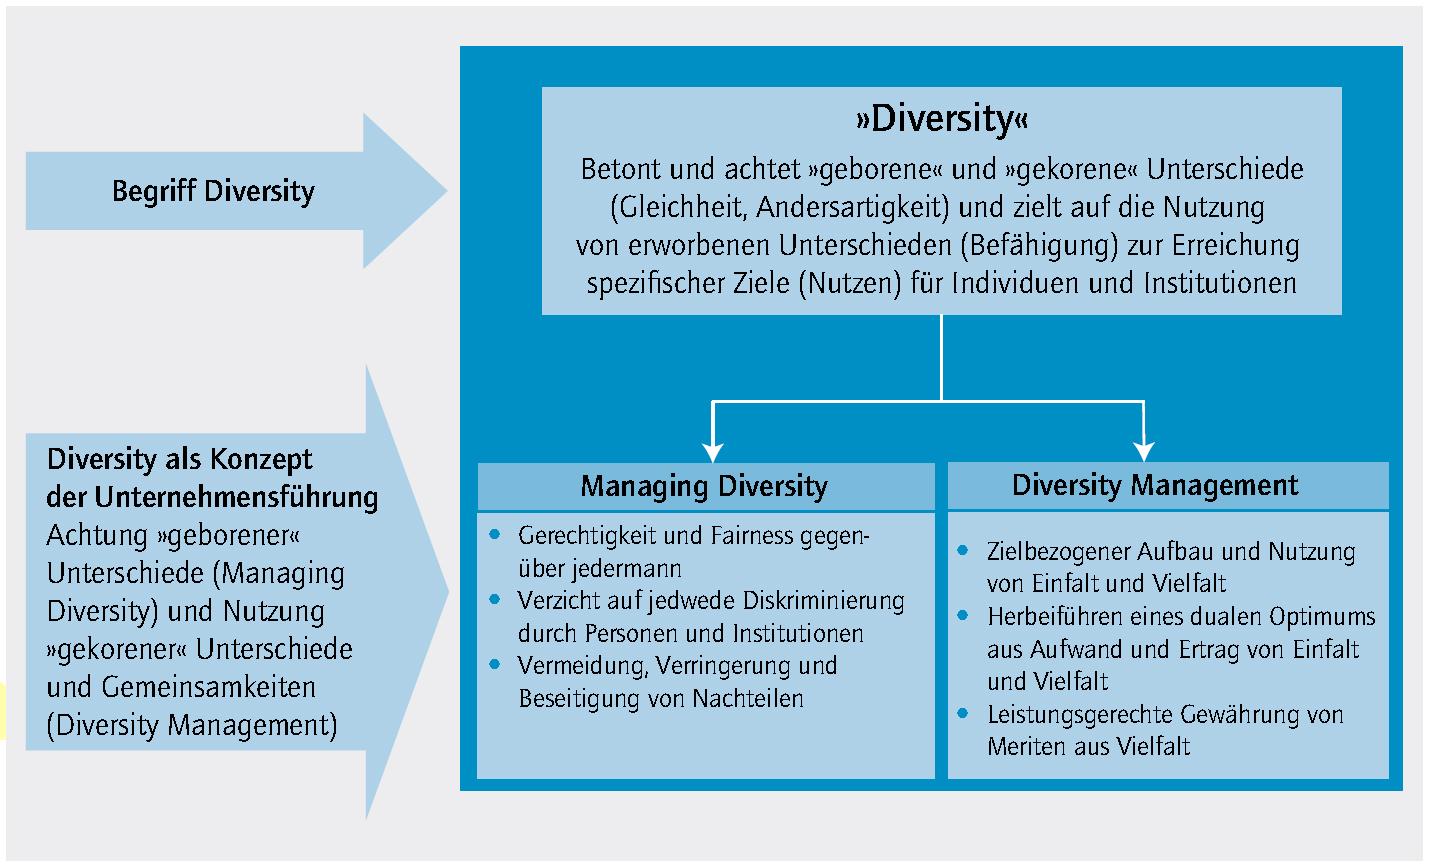 Aktueller Artikel in Fachmagazin: Managing Diversity vs. Diversity Management